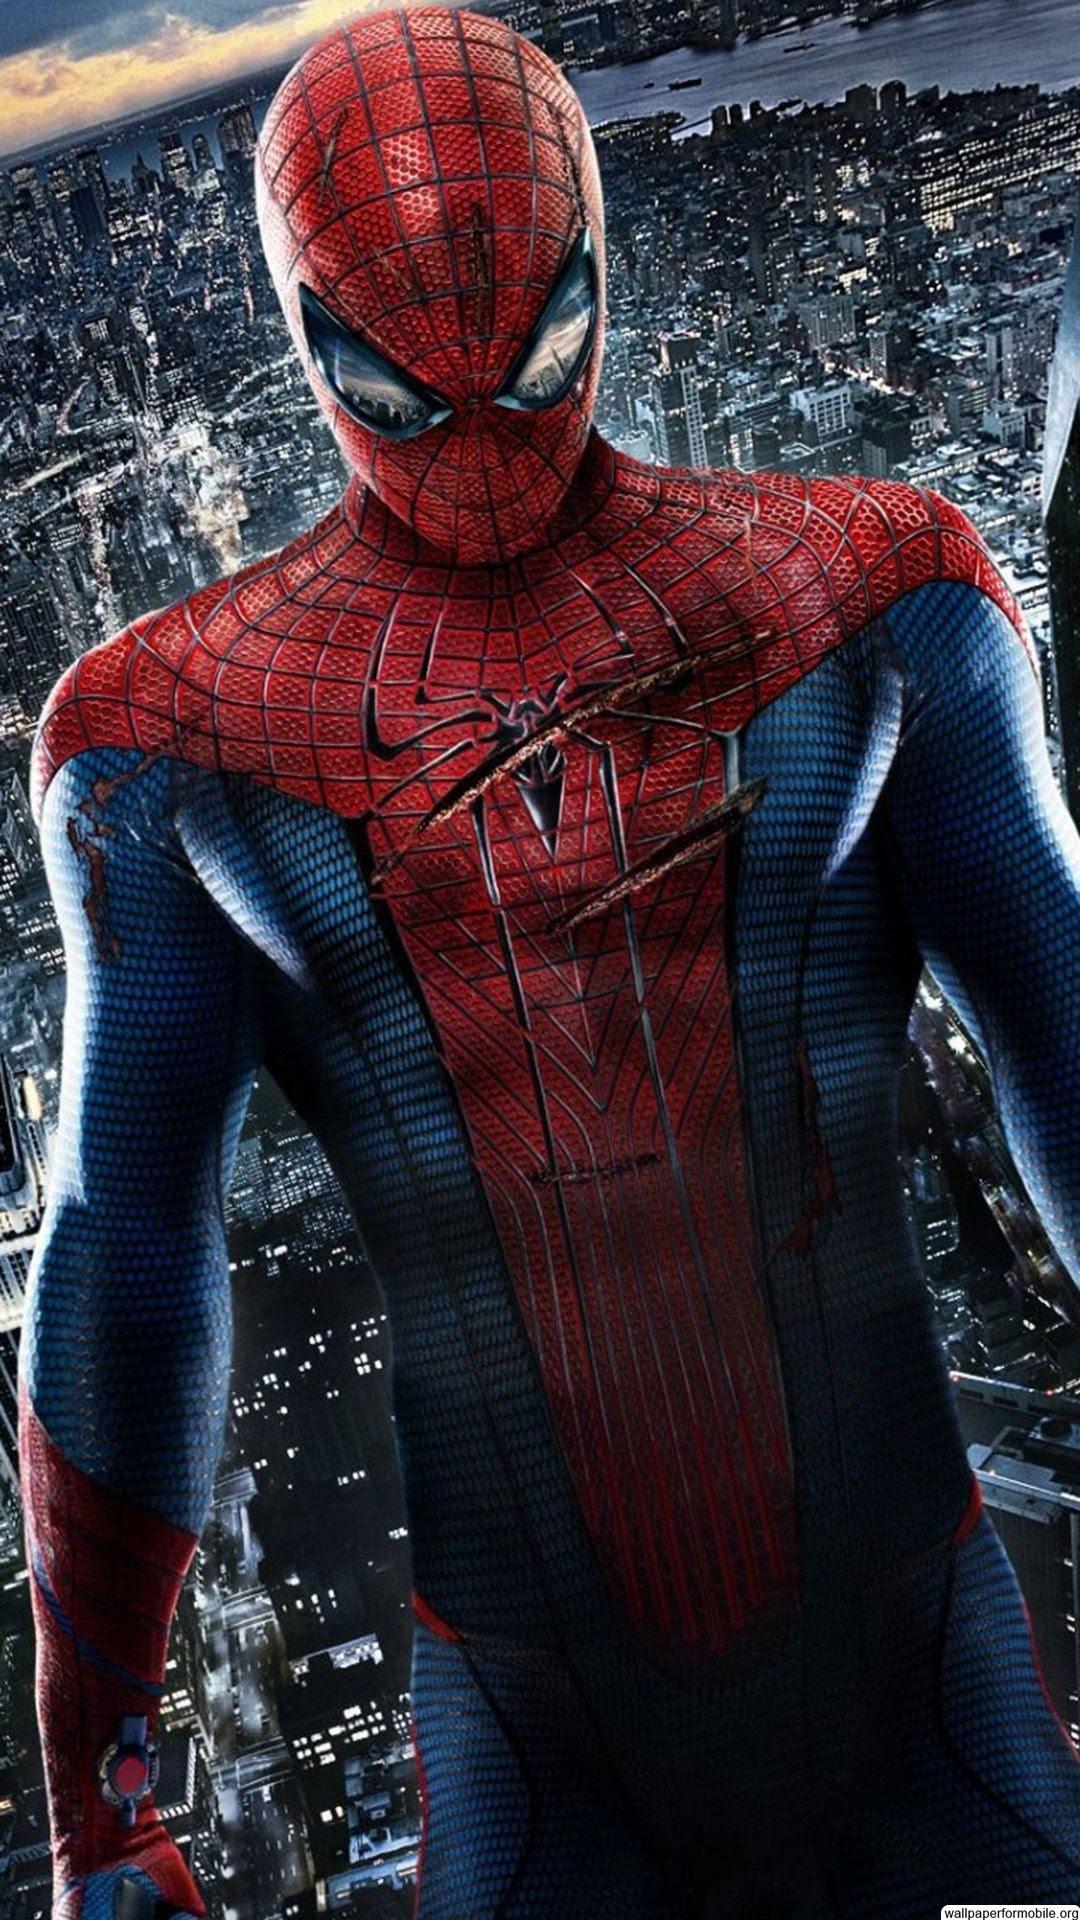 Spider Man Wallpaper Hd For Mobile